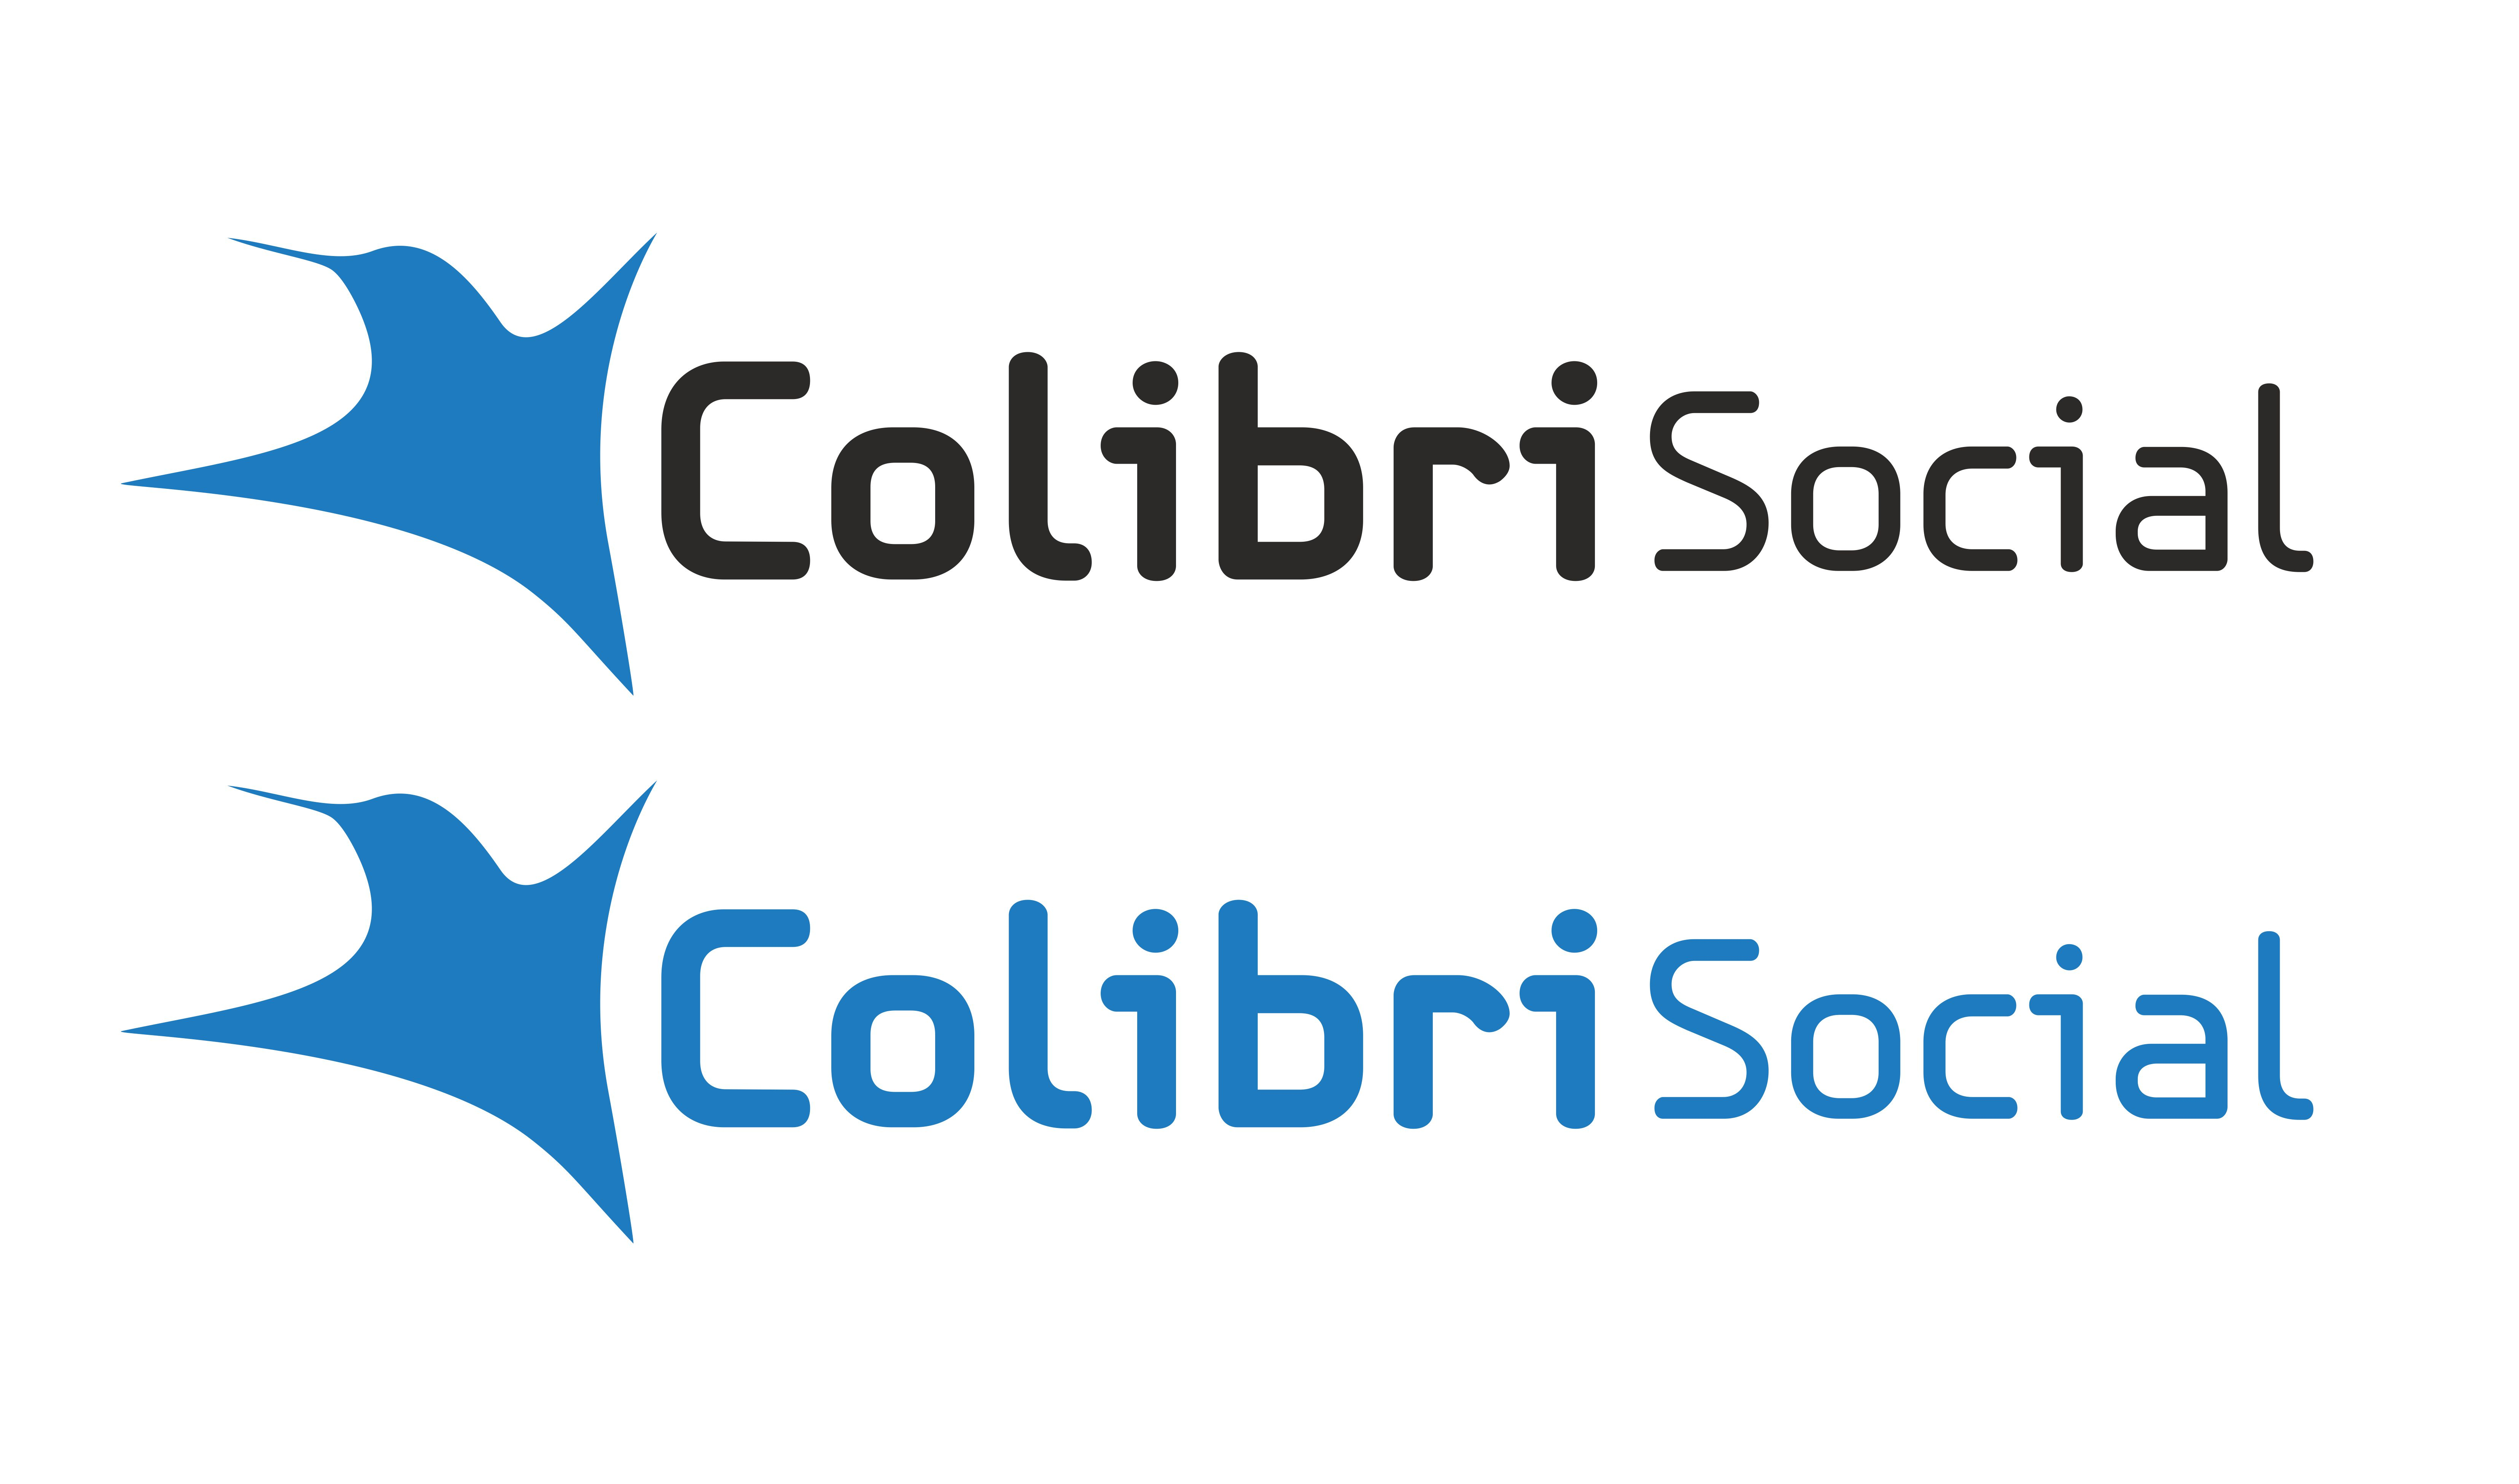 Дизайнер, разработка логотипа компании фото f_959558057466dc05.jpg